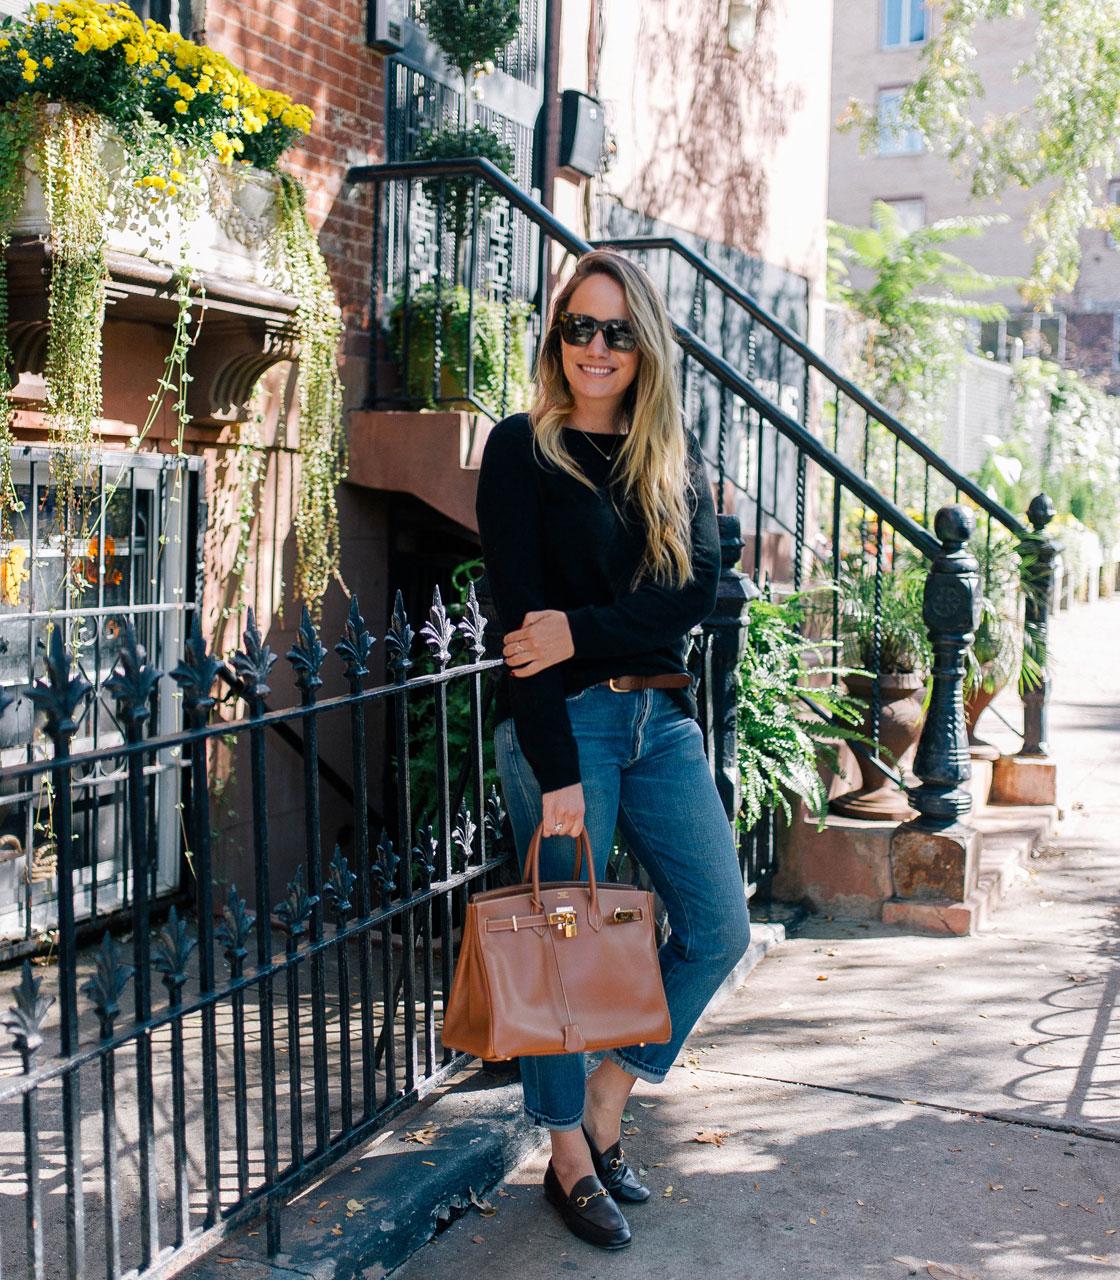 b9ec339bd98 Classic Fall Street Style